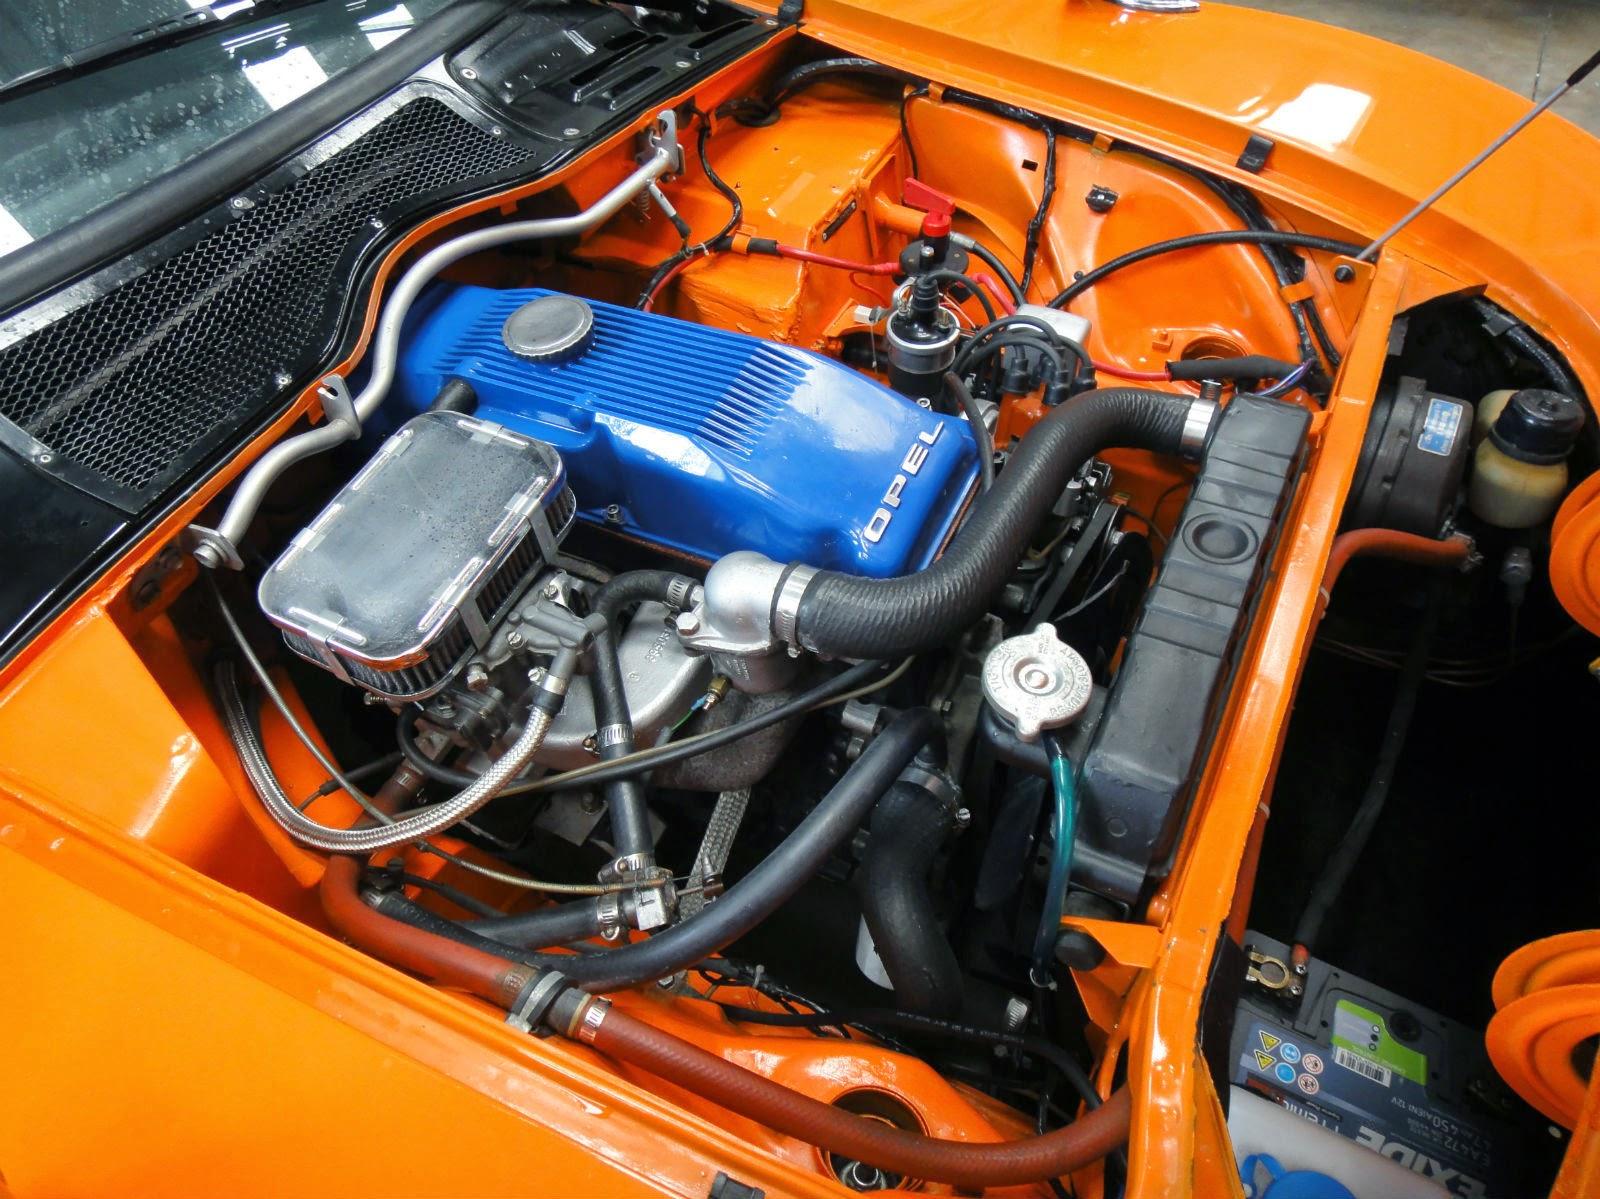 1970 opel gt fully restored | auto restorationice, Wiring diagram